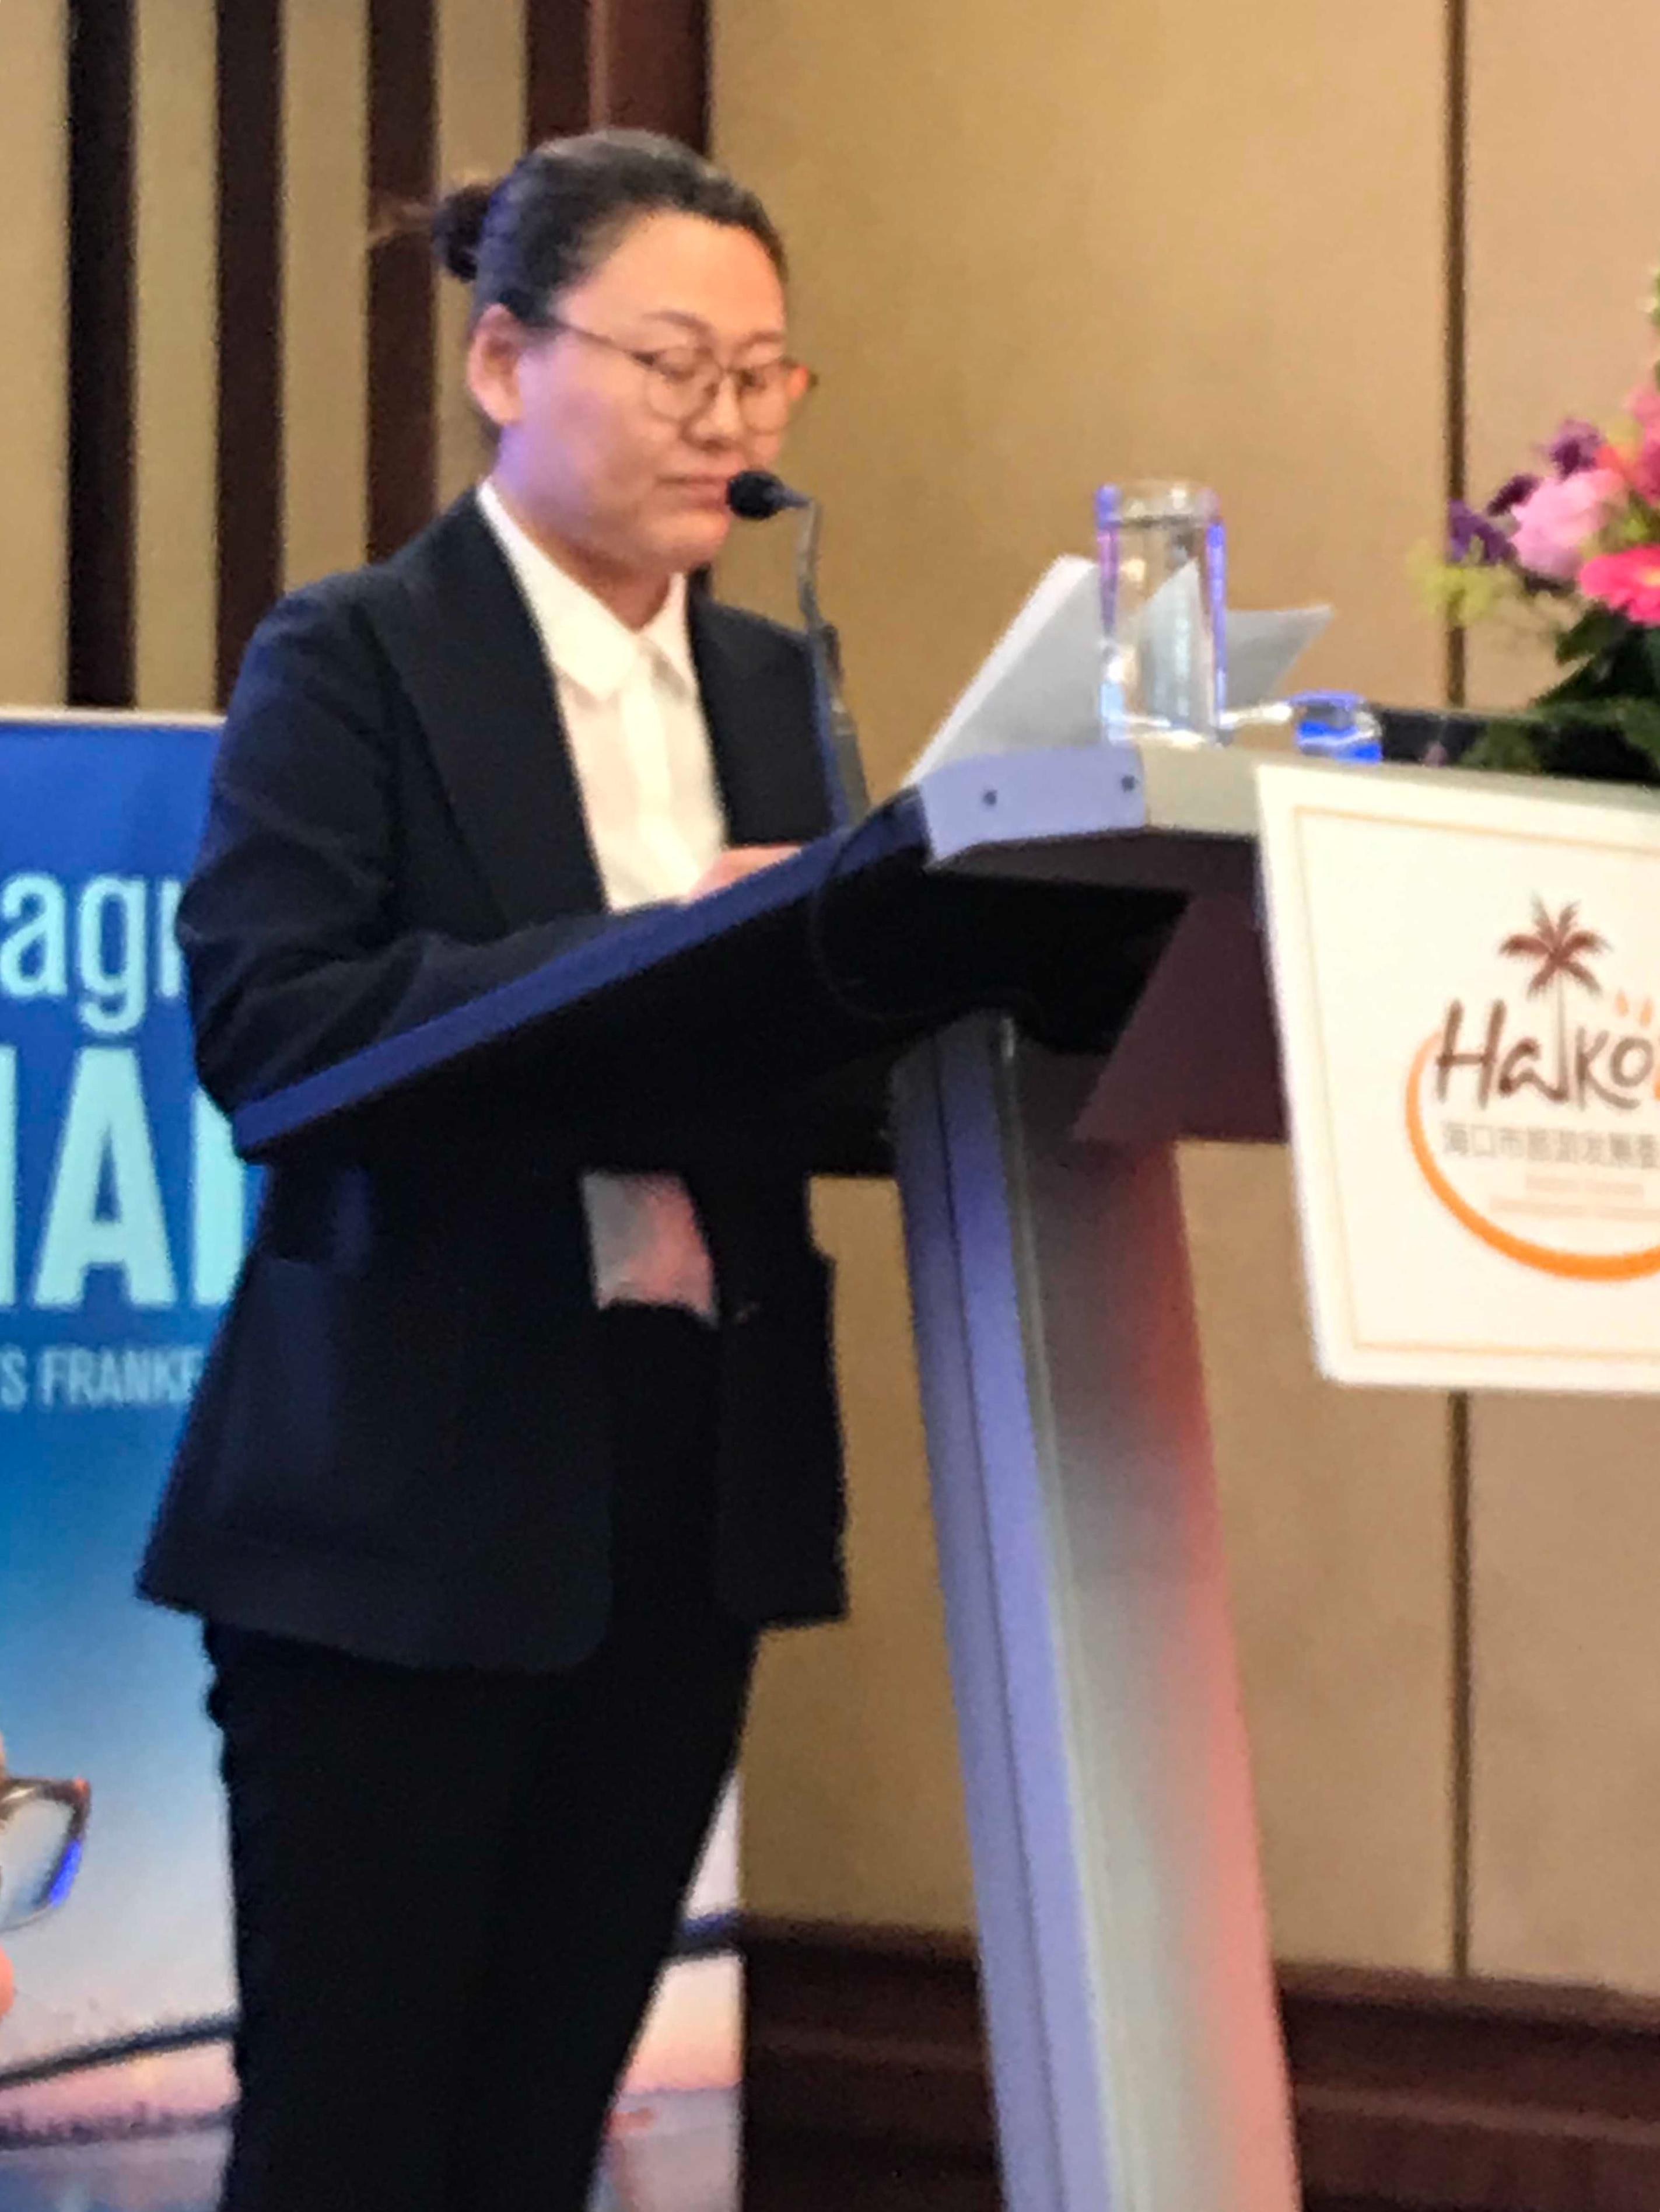 Generaldirektorin FU Tian Fang erläuterte die Zielsetzungen der Präsentation